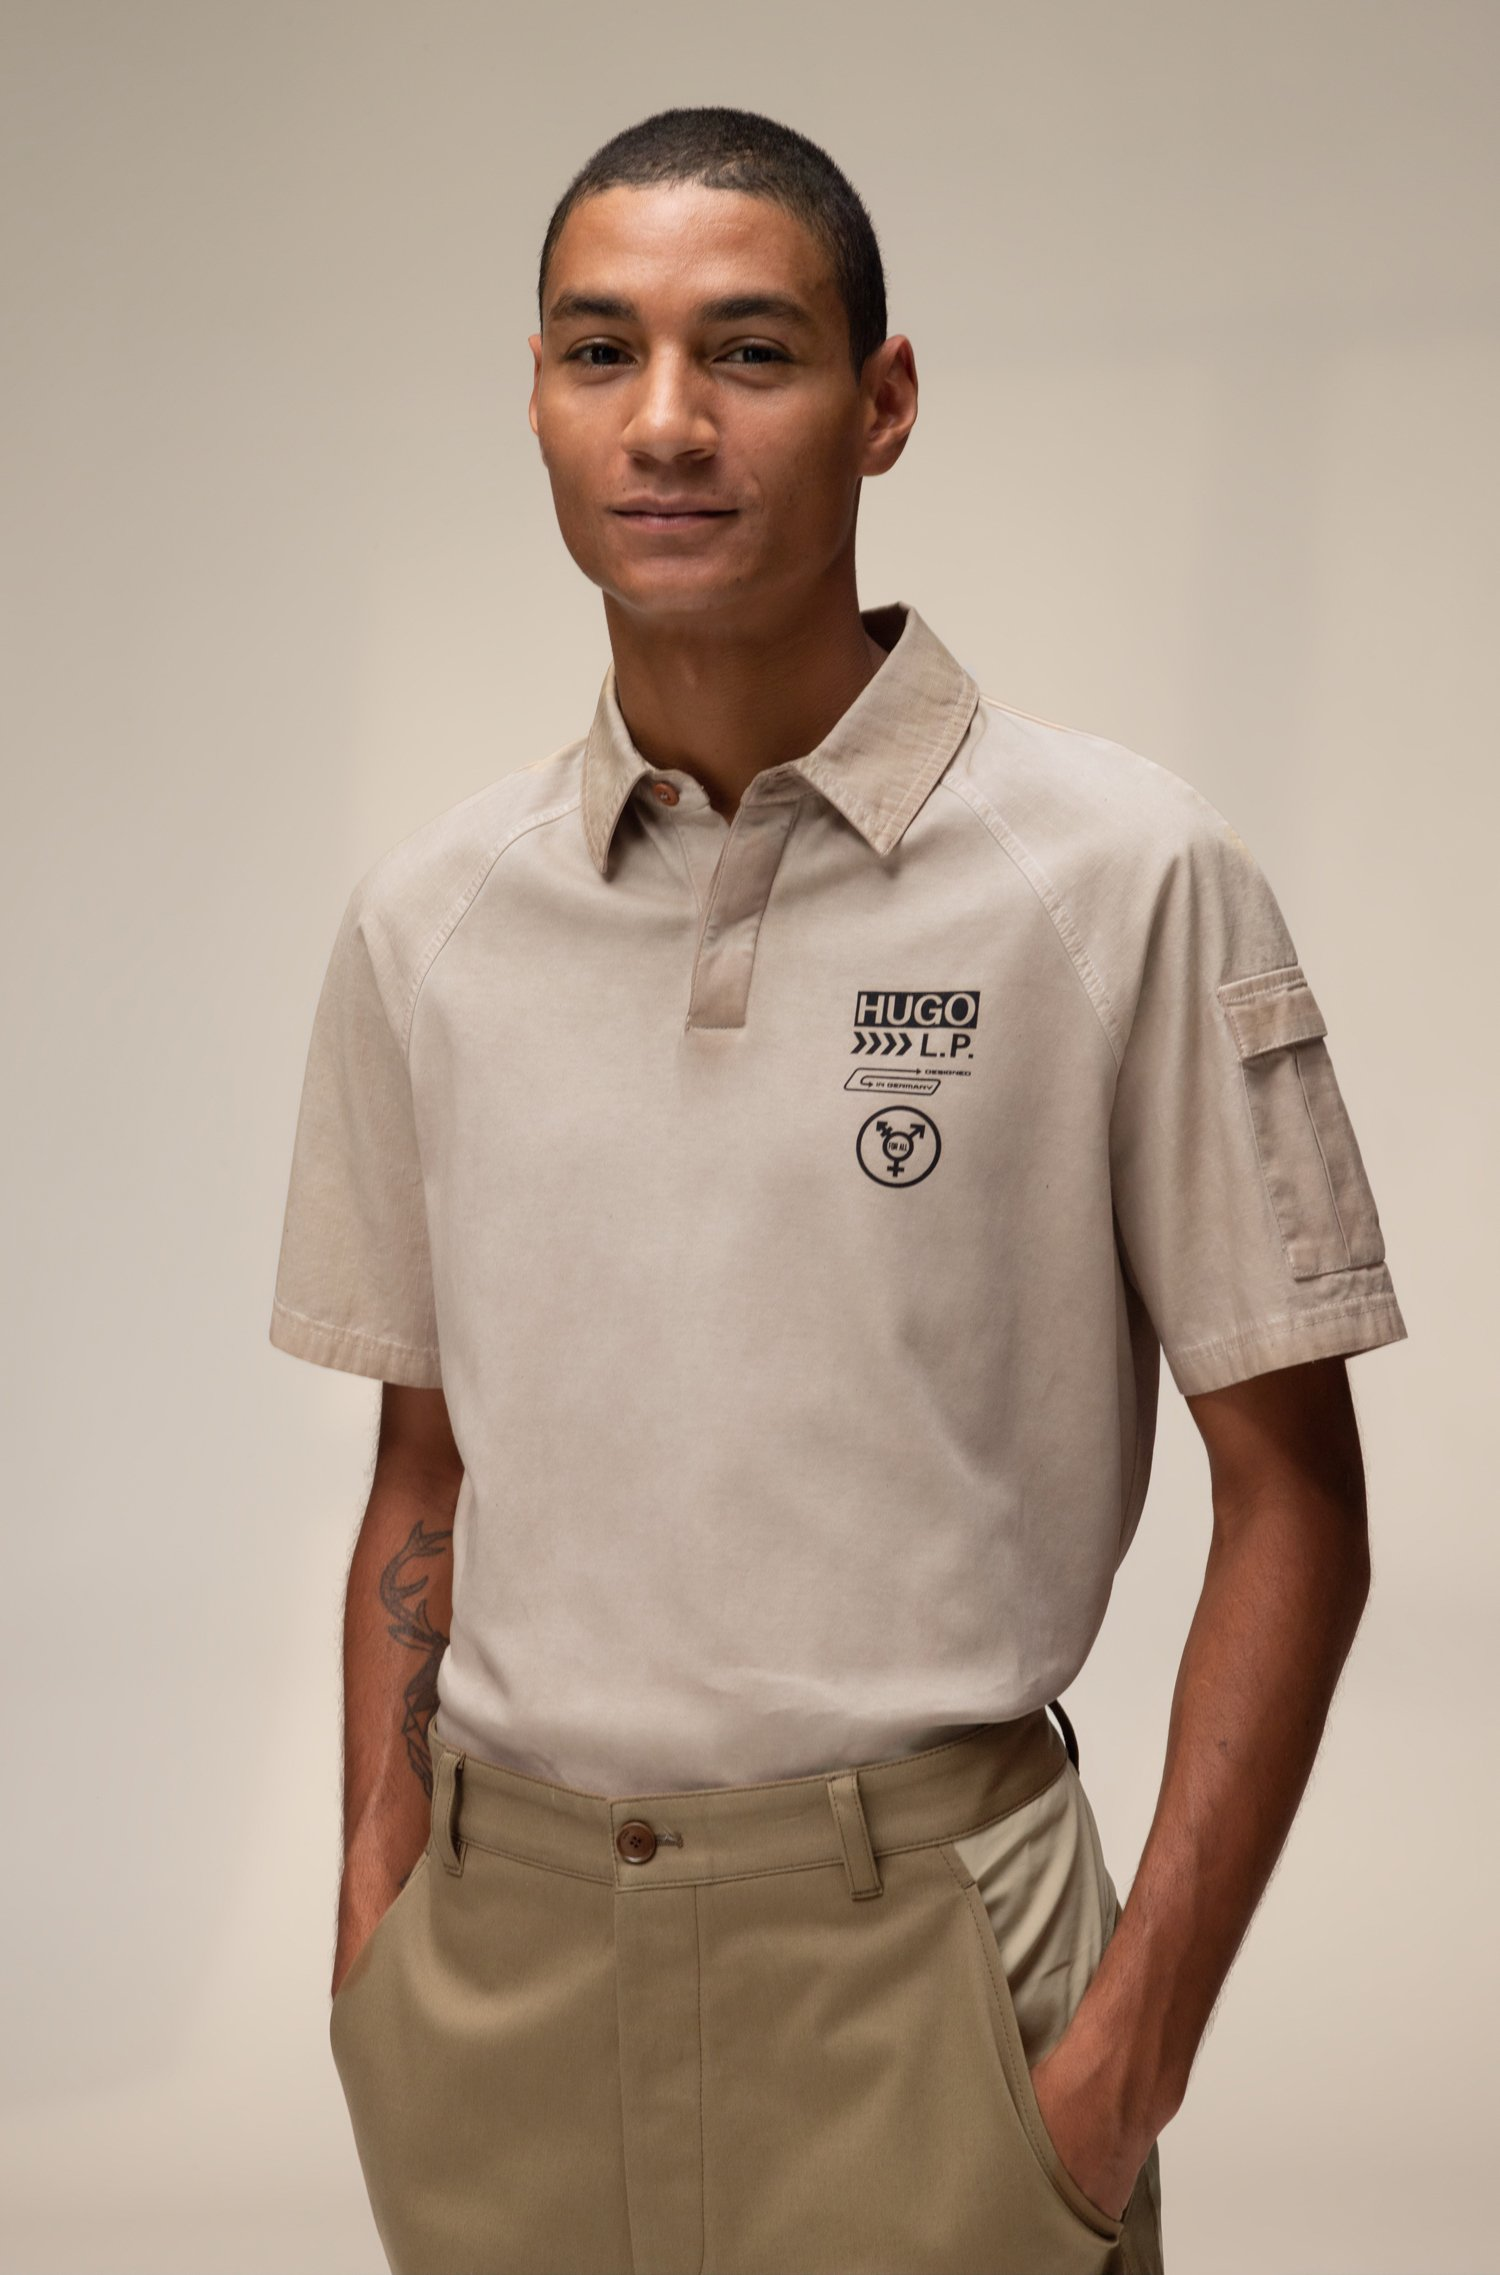 Unisex polo shirt in cotton with chevron-print logo, Beige